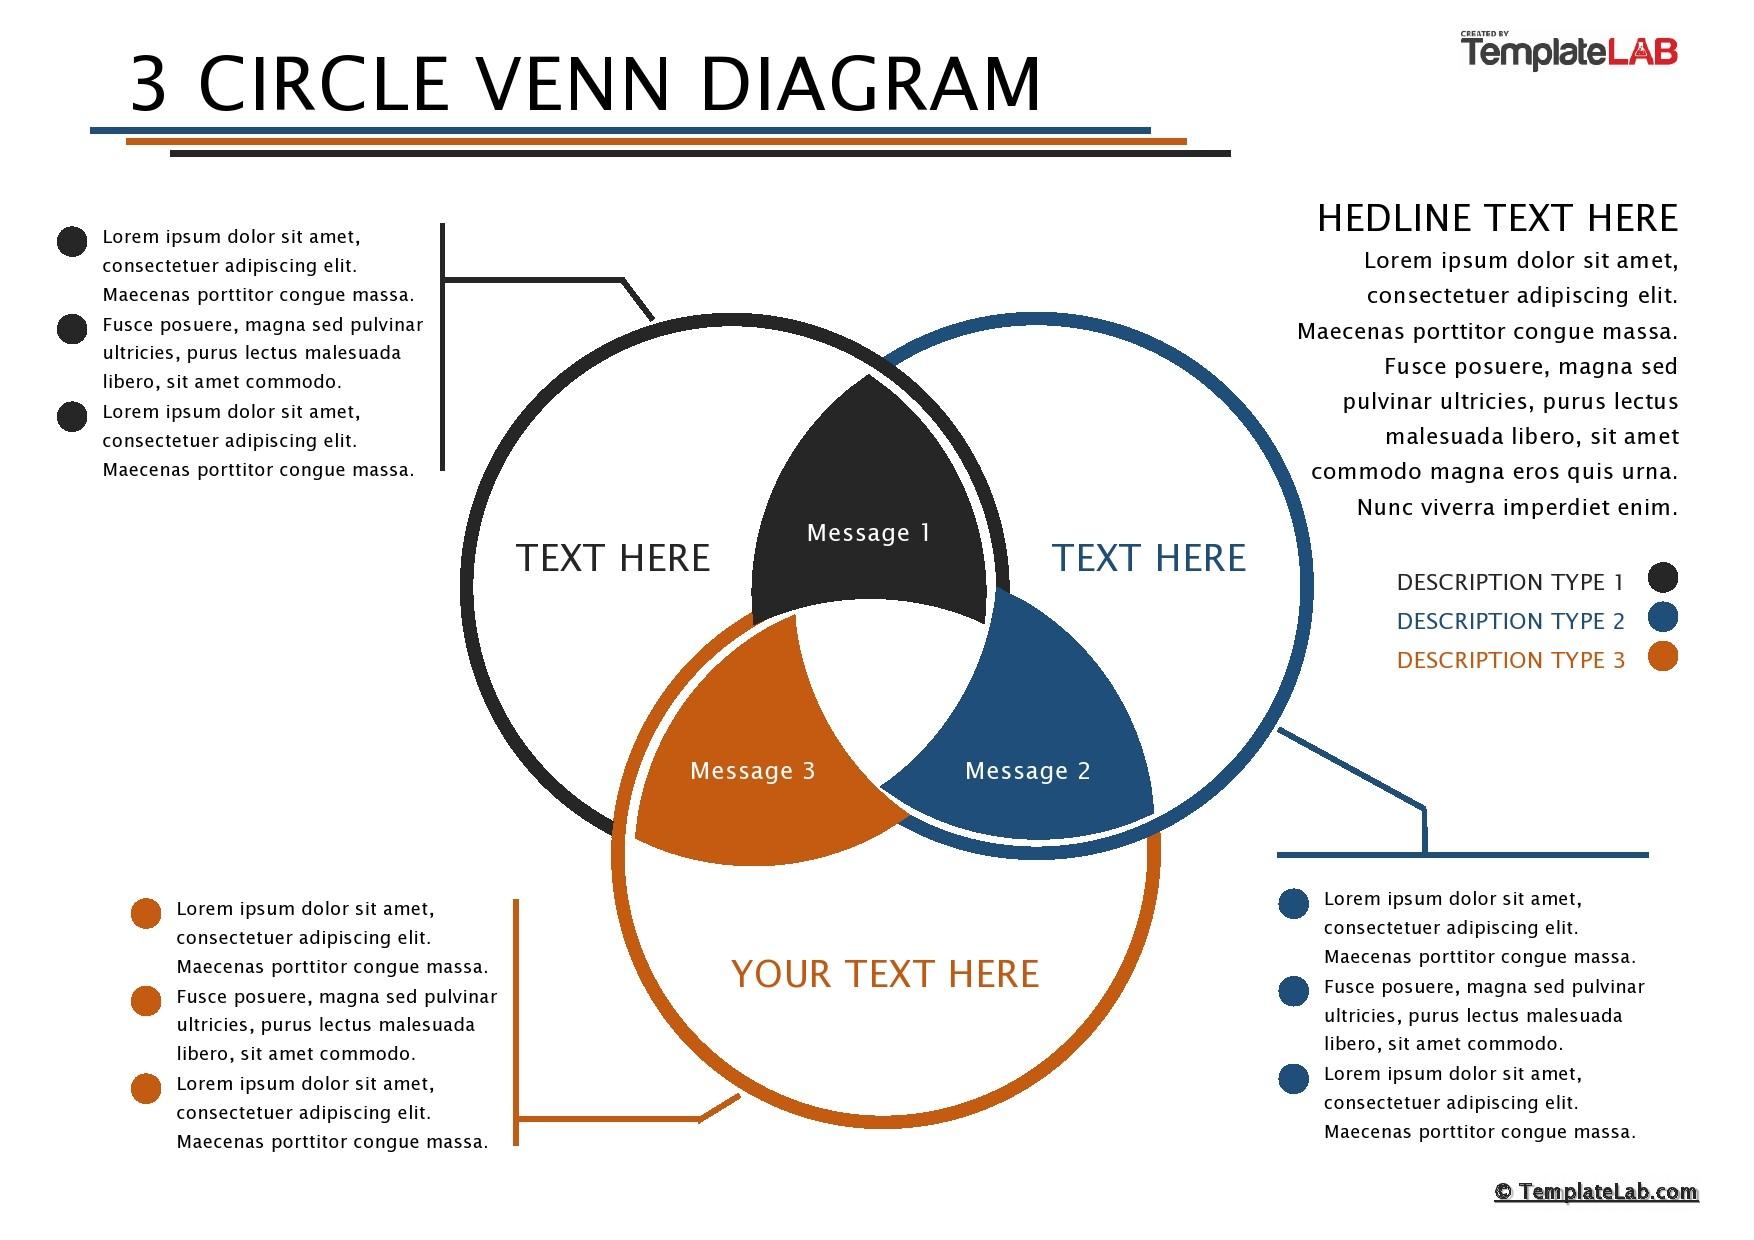 Free 3 Circle Venn Diagram Template 02 - TemplateLab.com